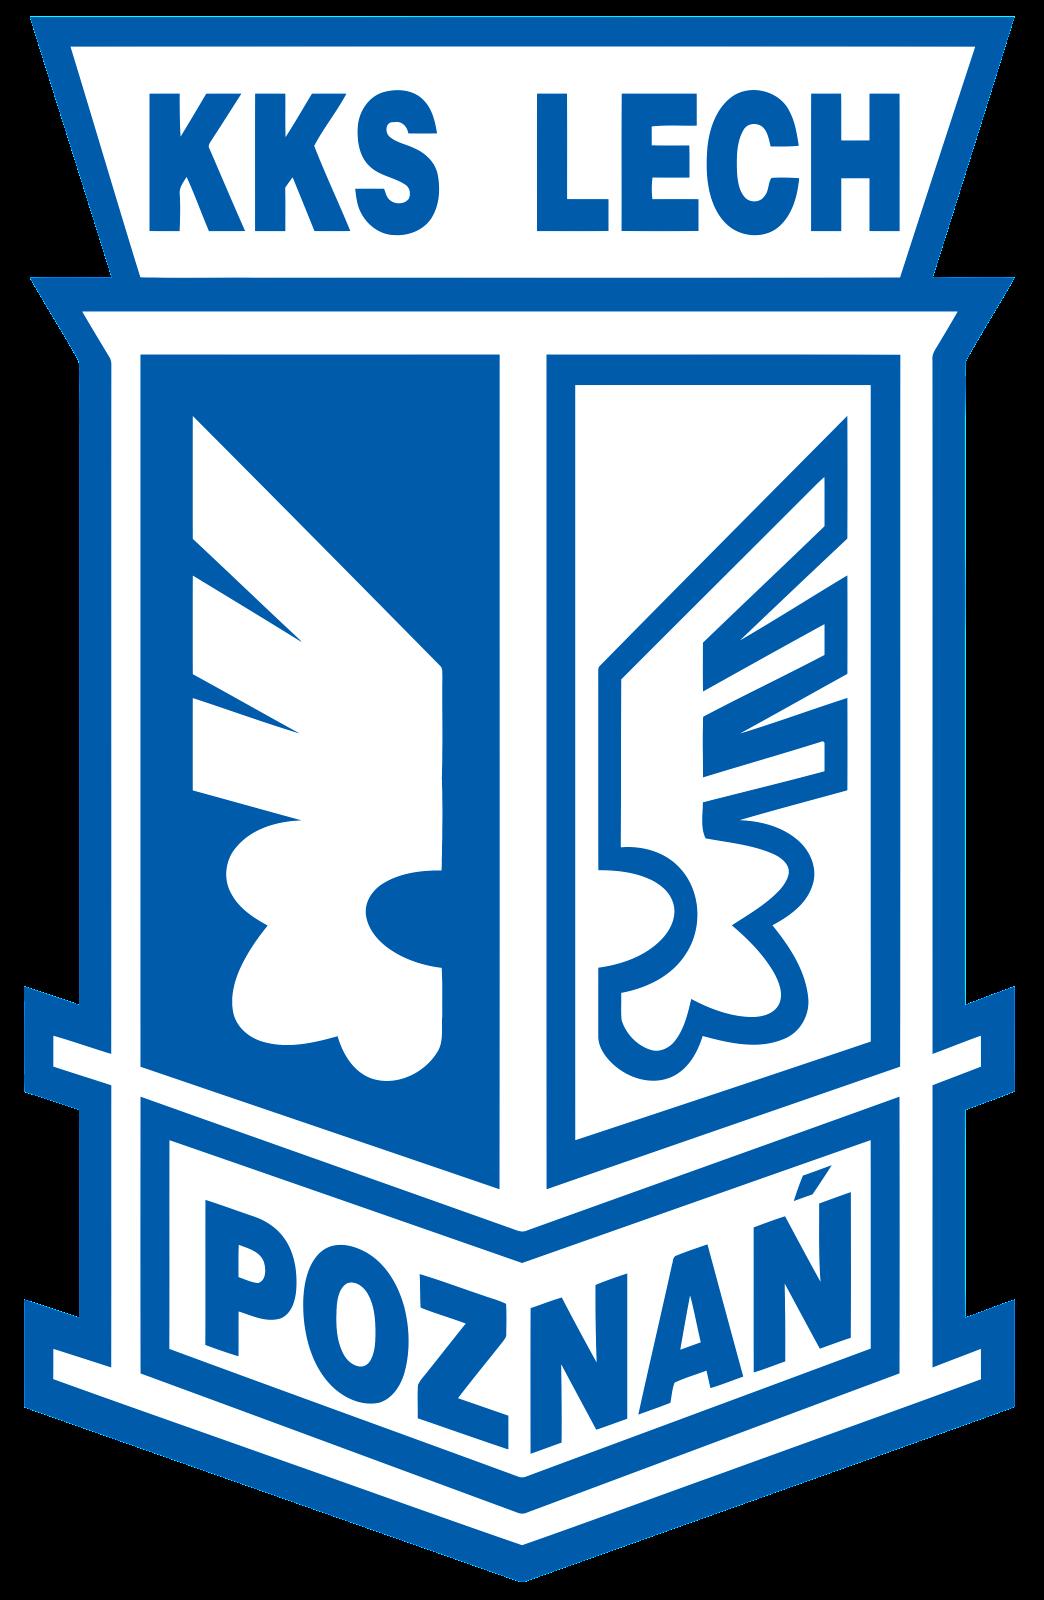 KKS LECH POZNAŃ Poznań, Tapety, Piłka nożna